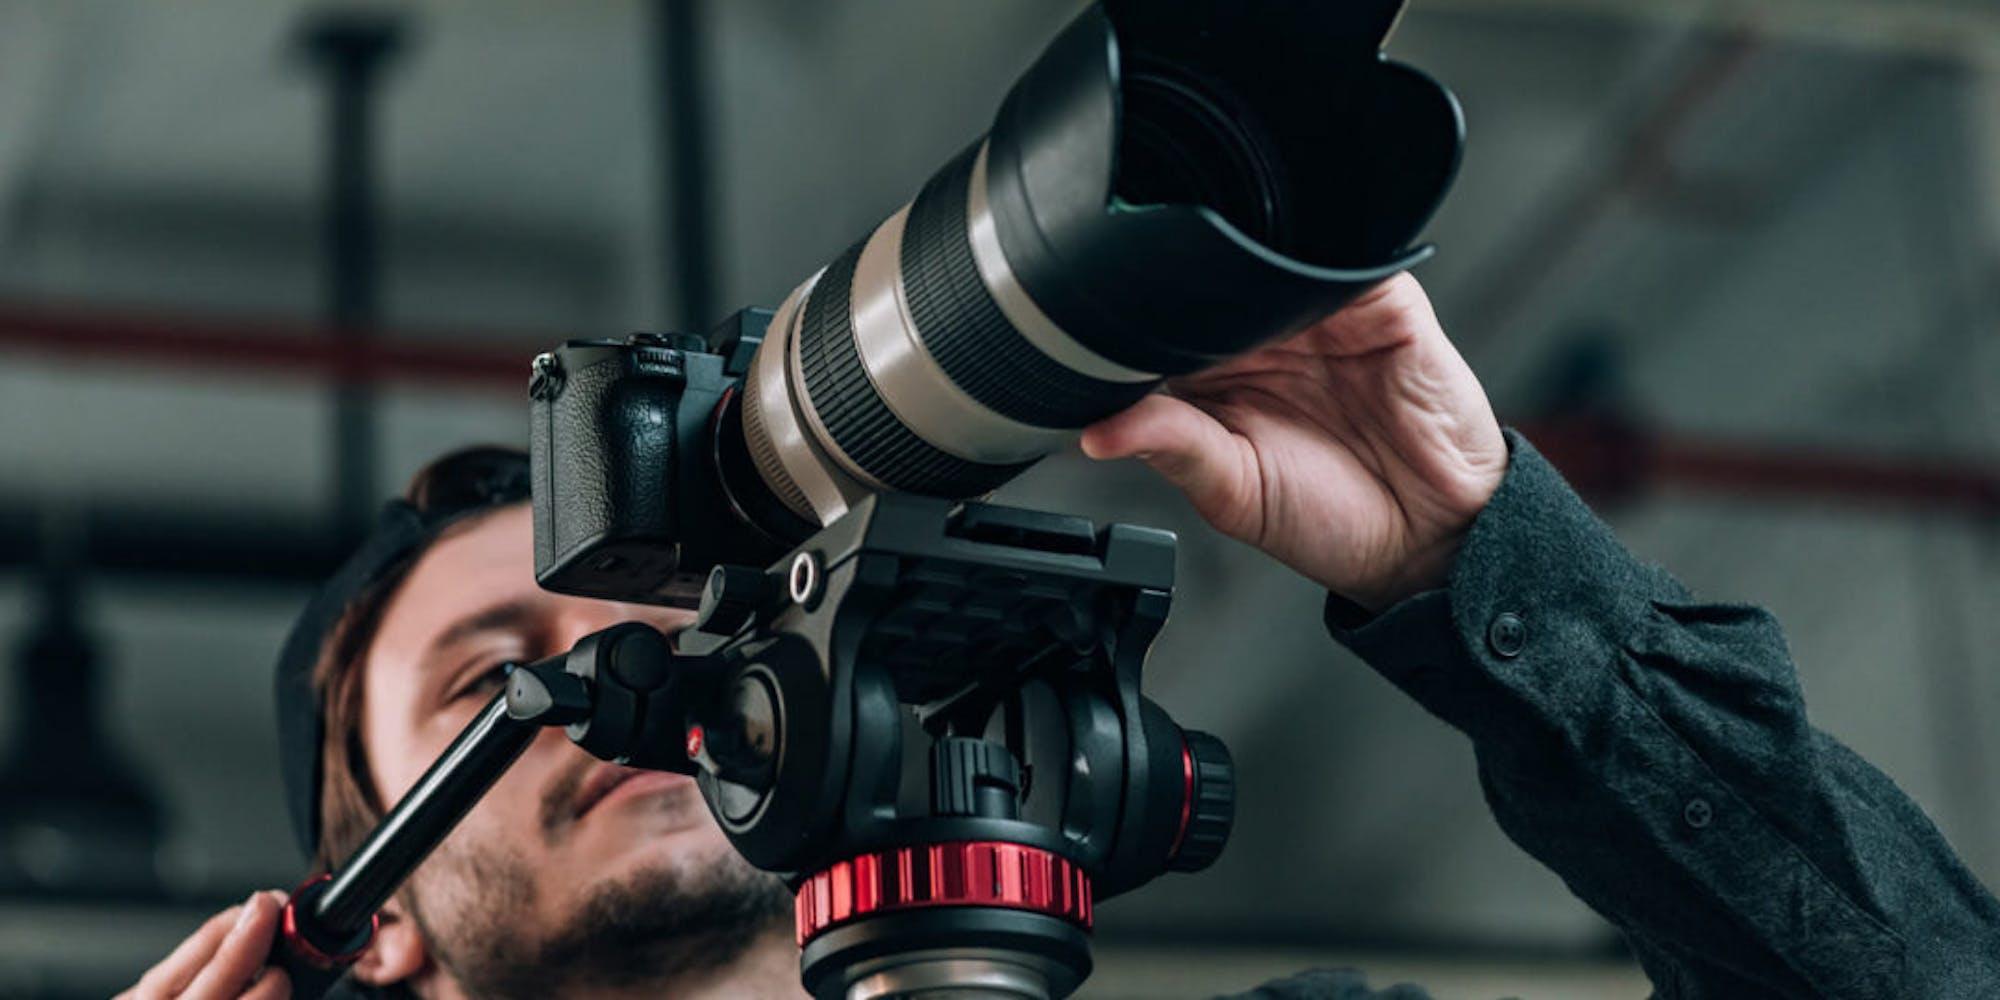 A guy using a camera on tripod